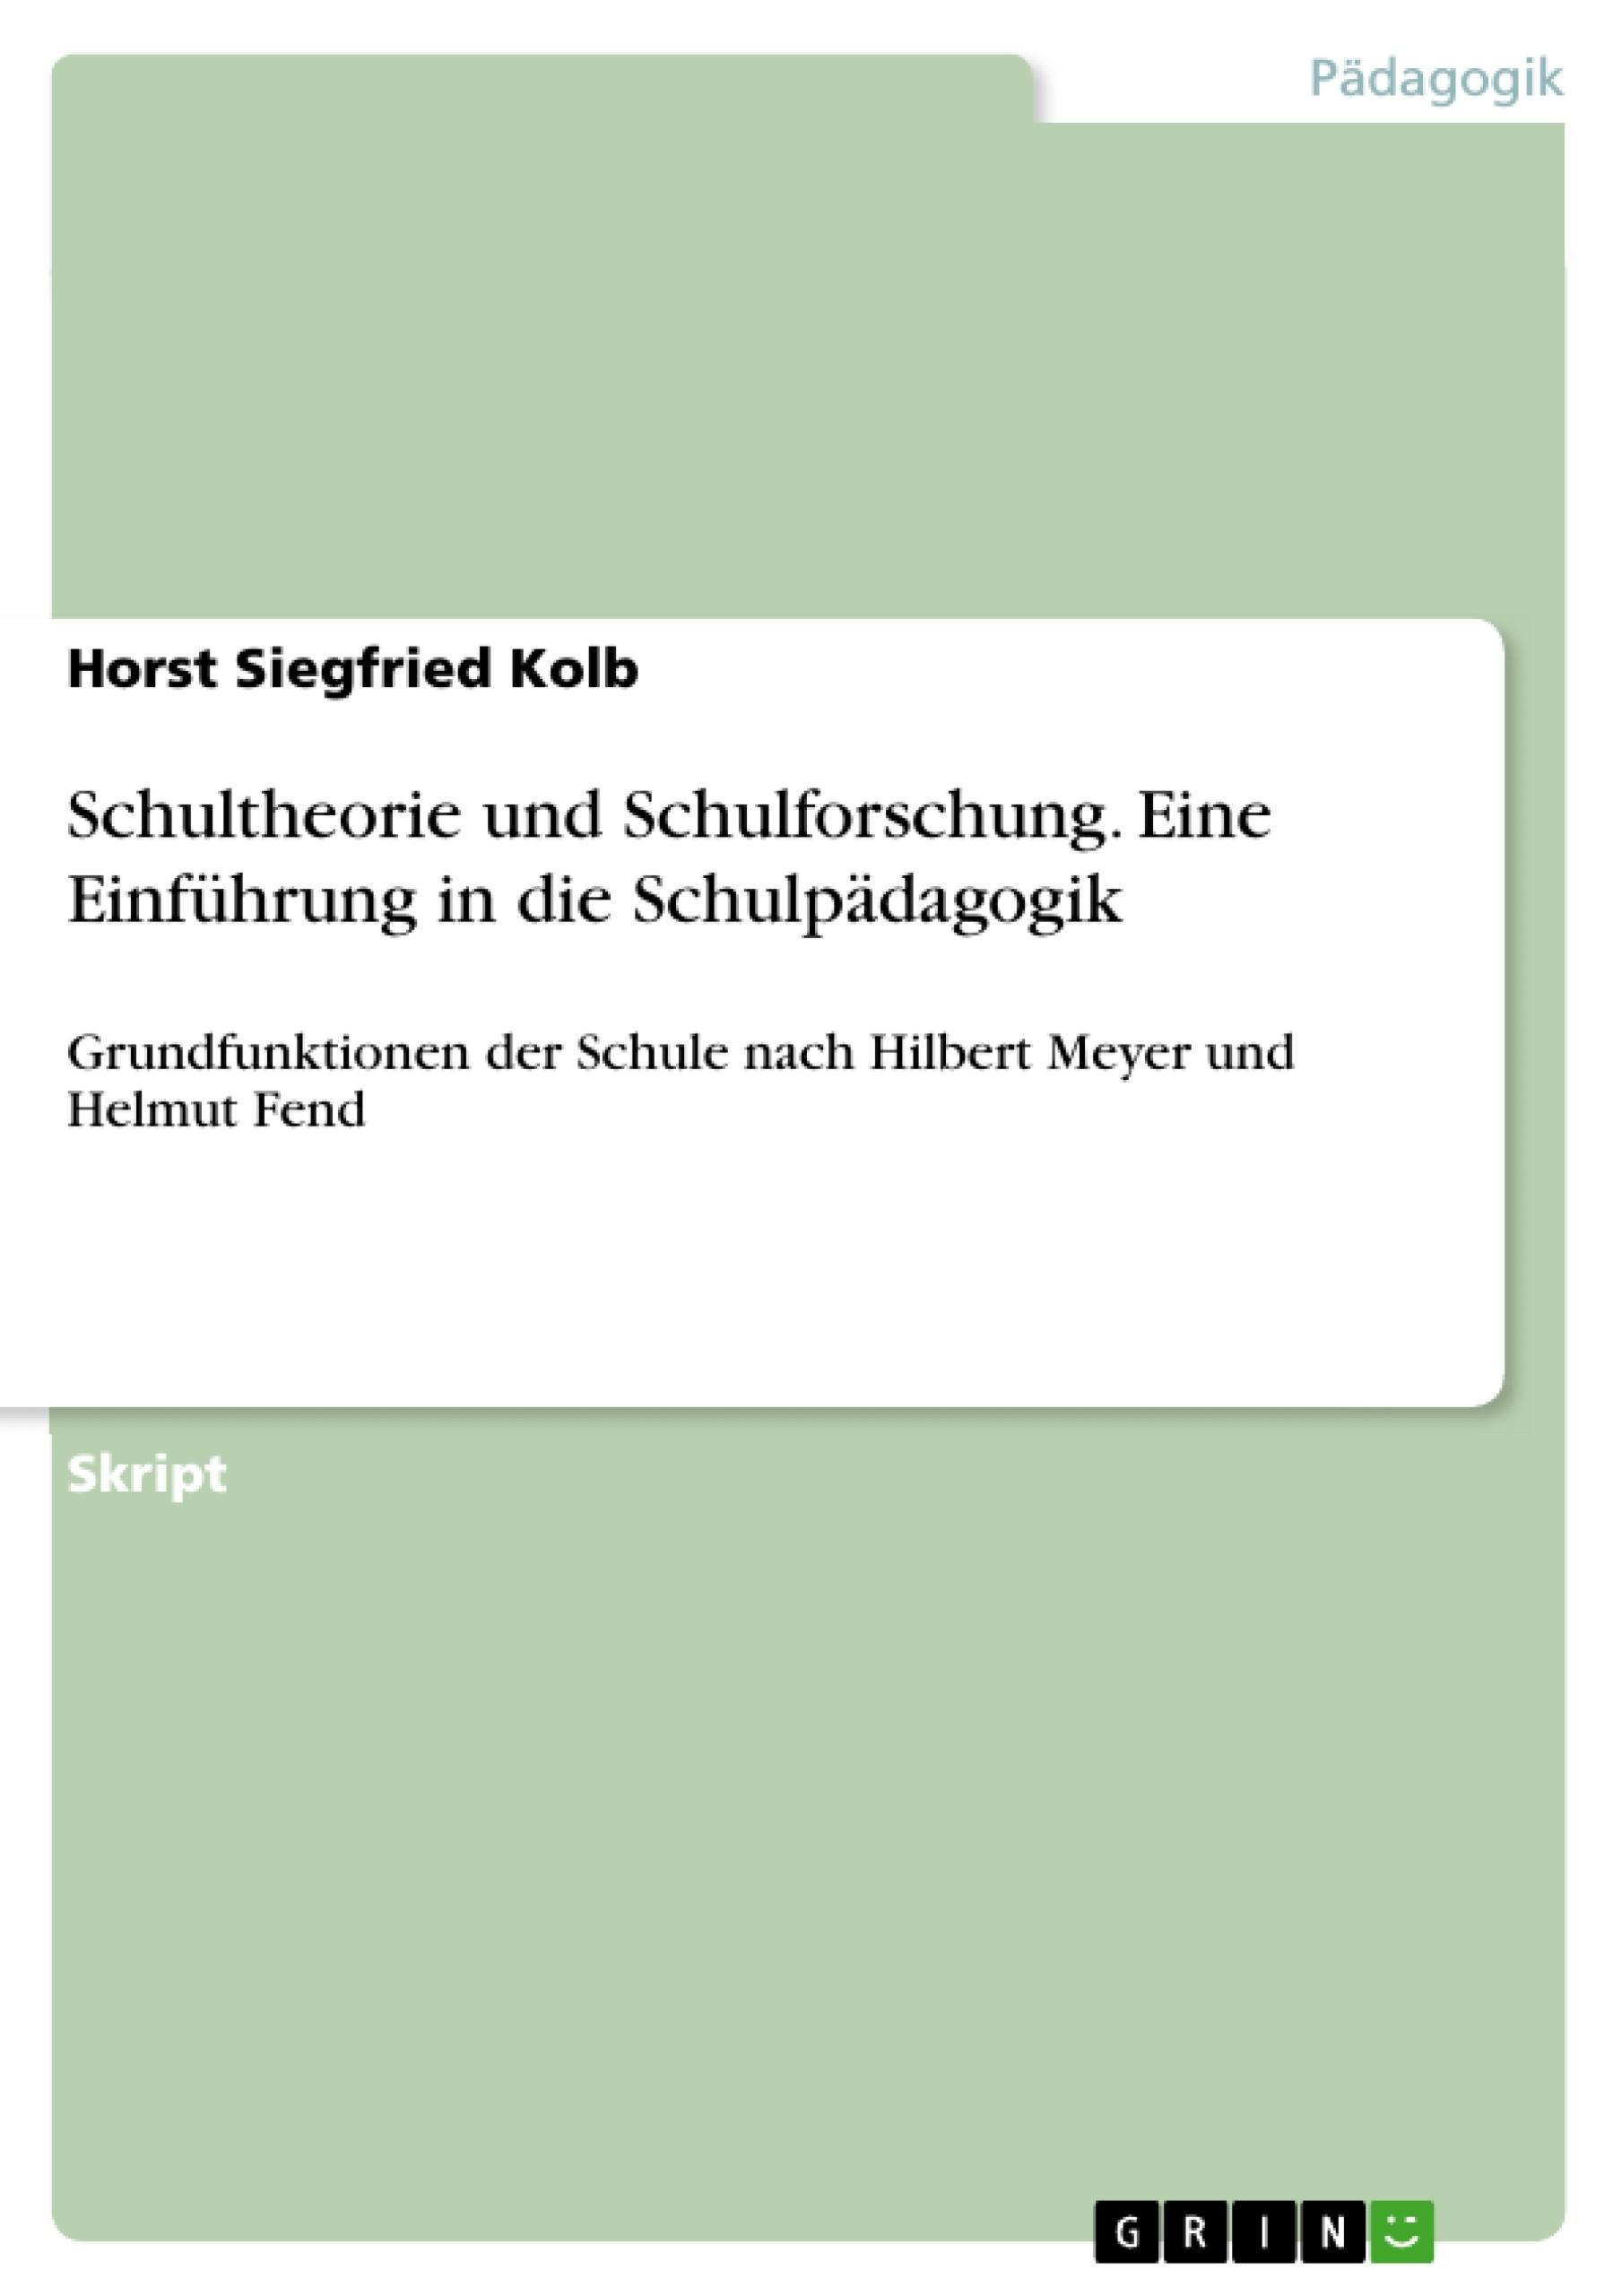 ebook Proceedings of the 33rd